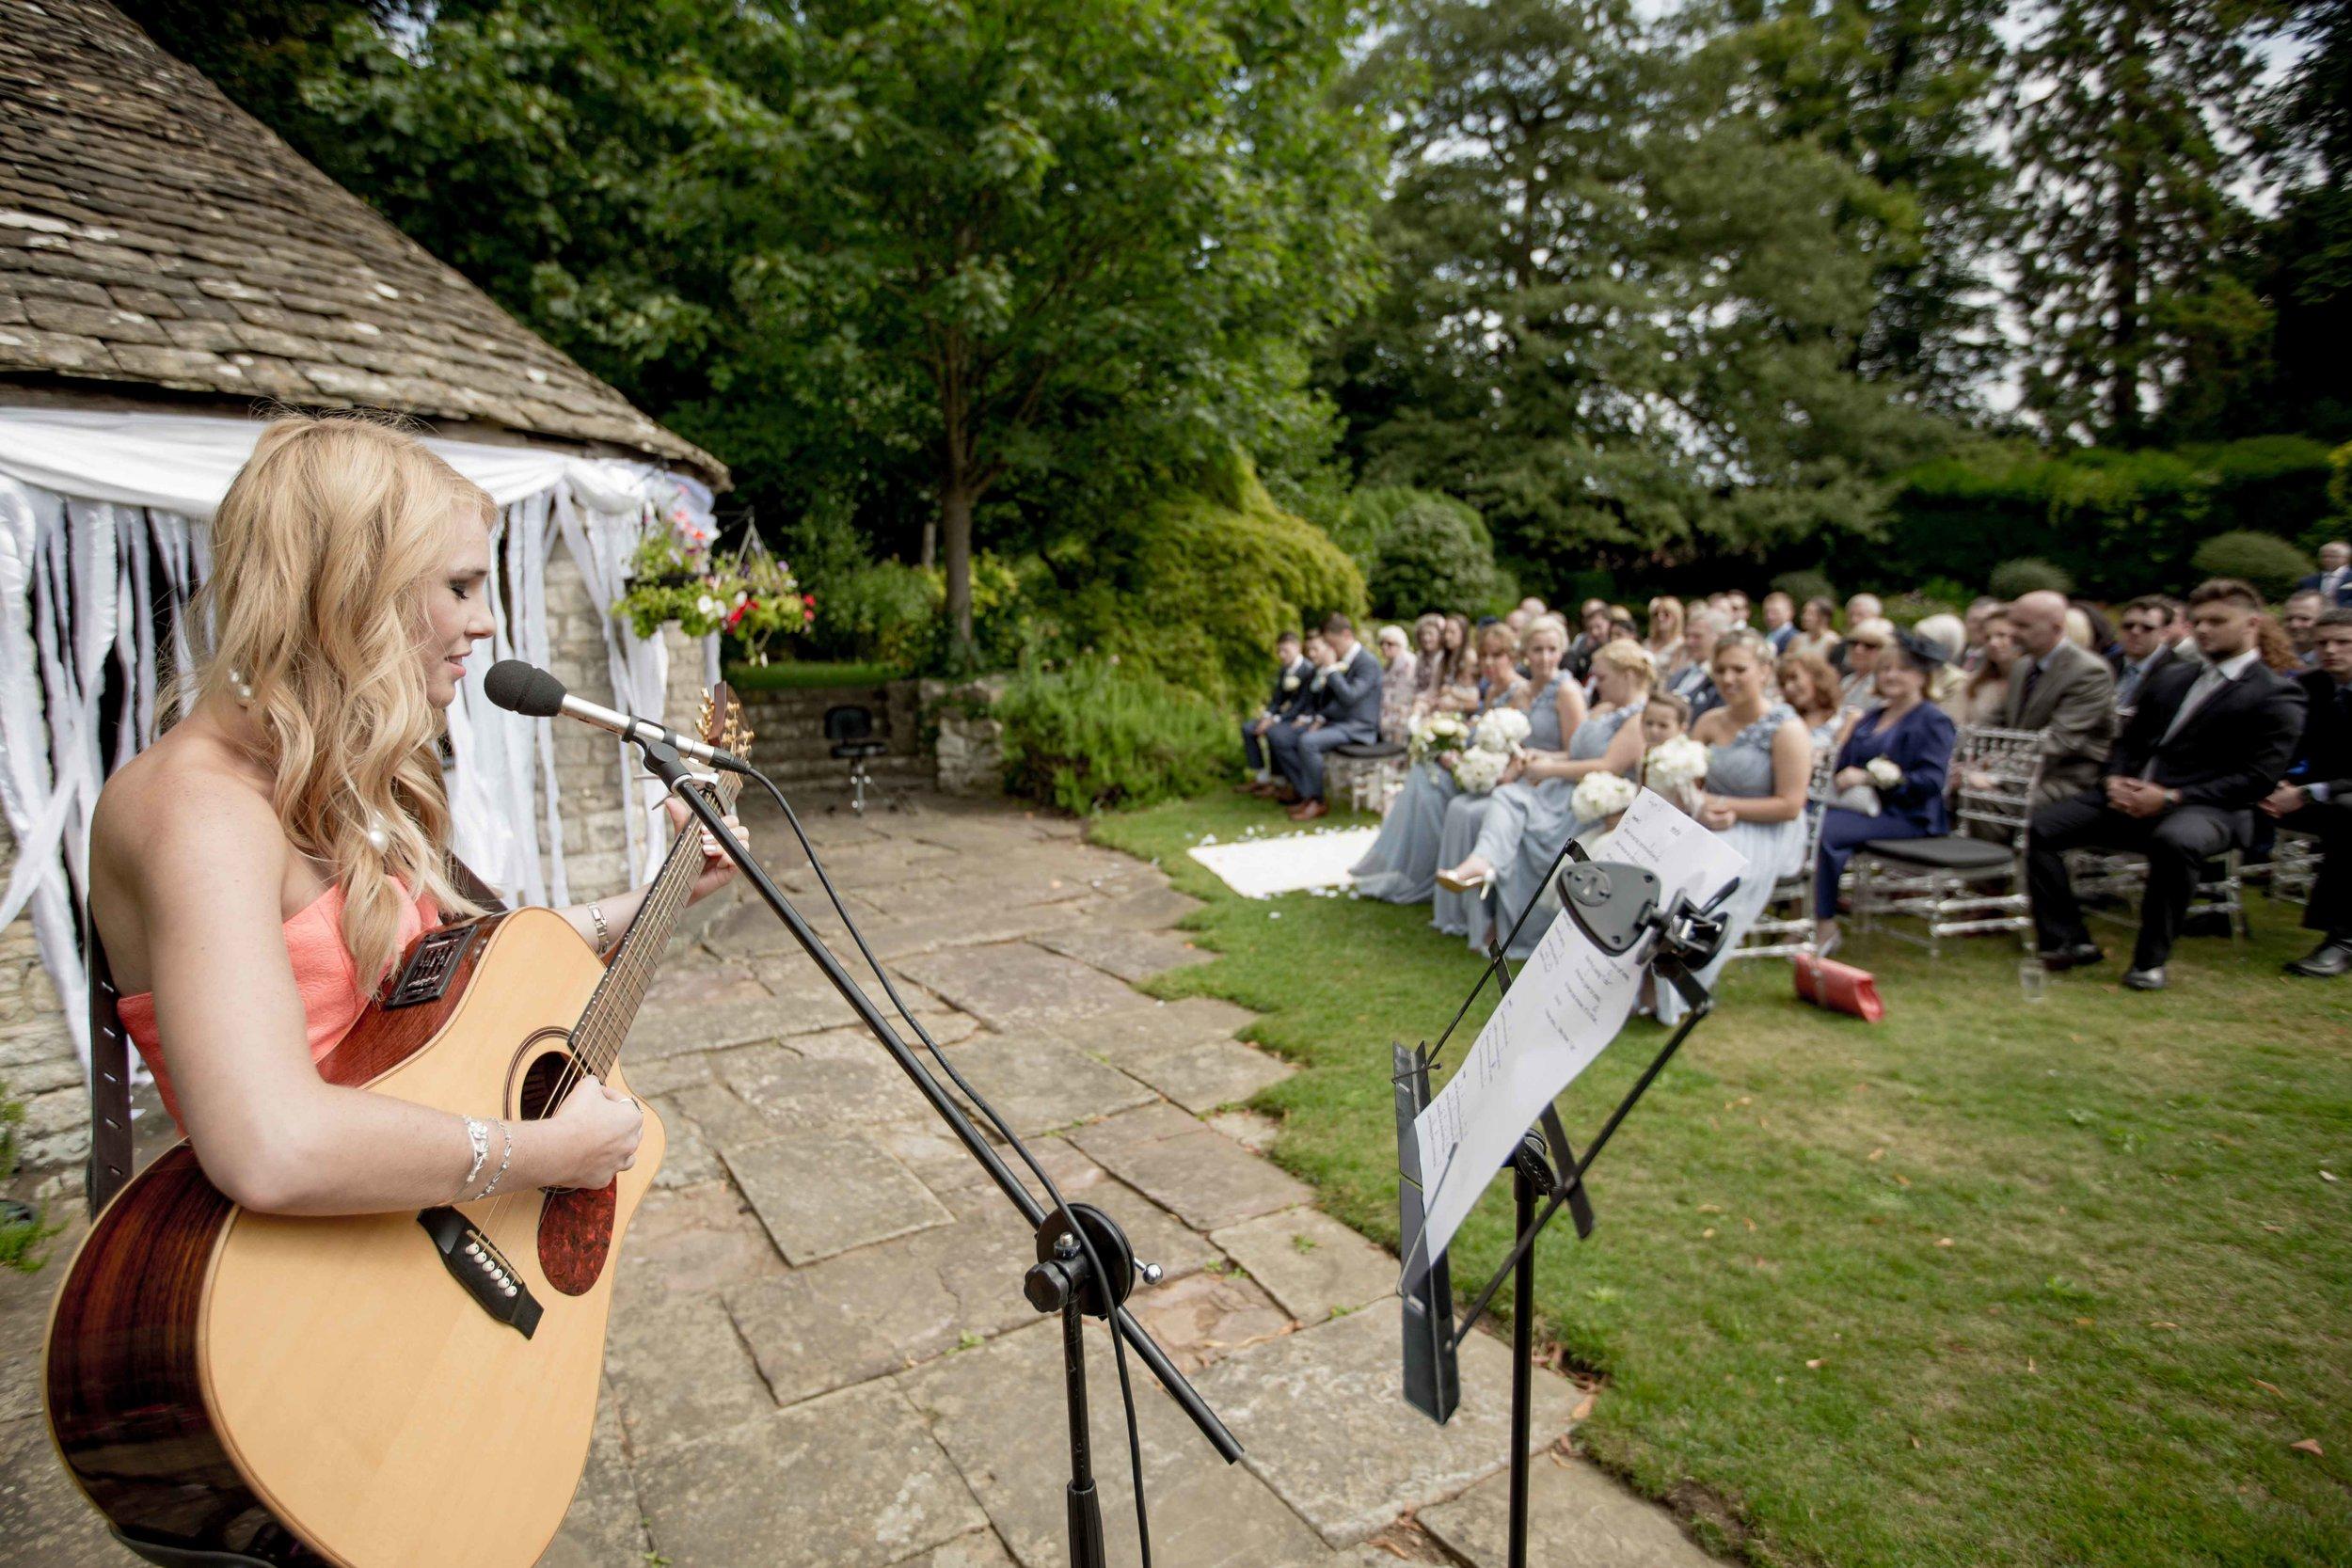 cotswold-wedding-photography-at-stonehouse-court-hotel-natalia-smith-photography-gloucestershire-wedding-photographer-45.jpg